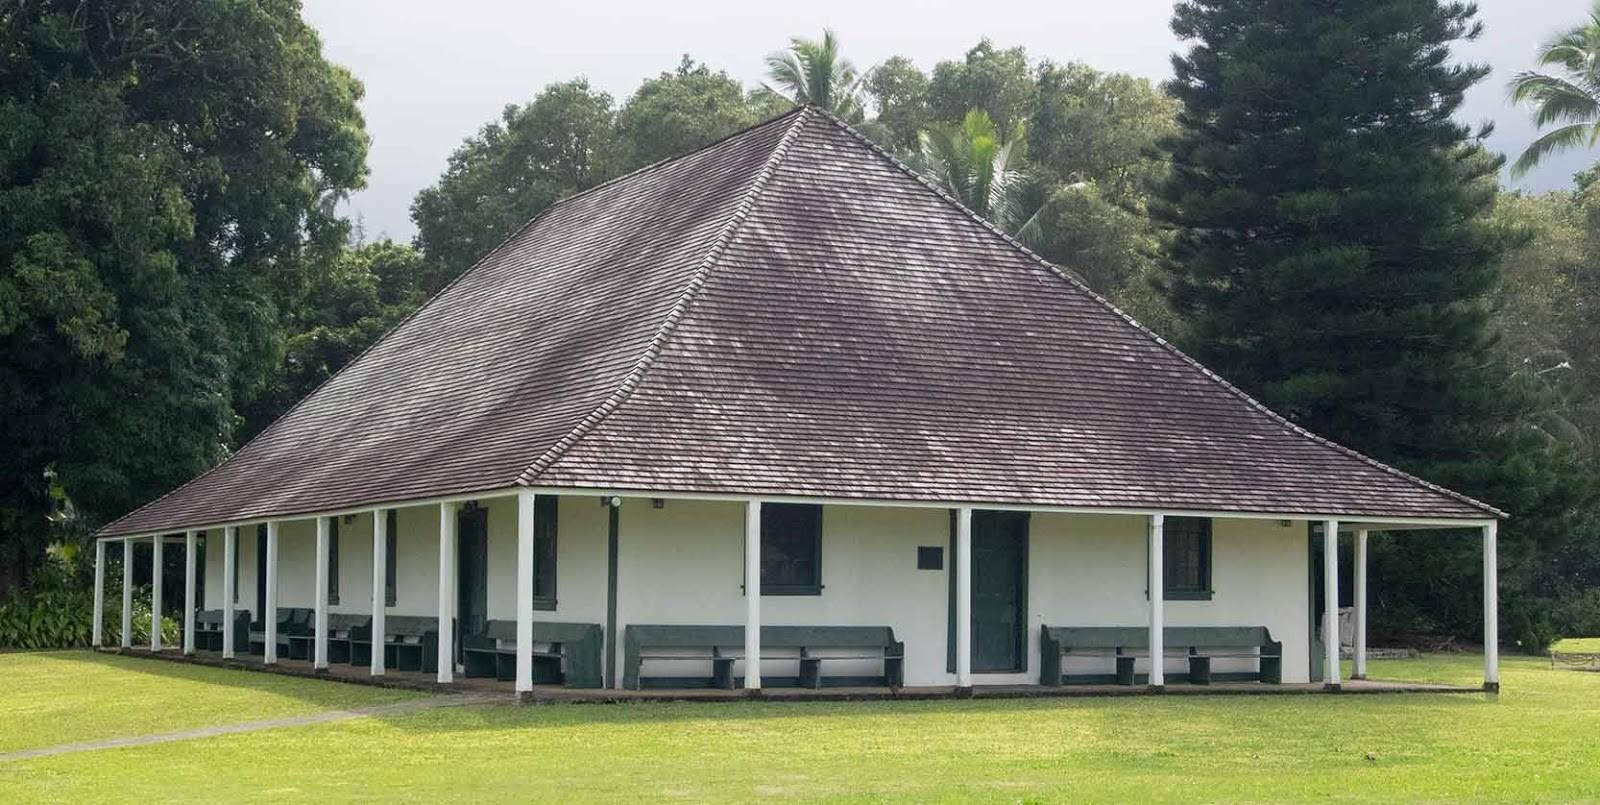 Большая вальмовая крыша у дома